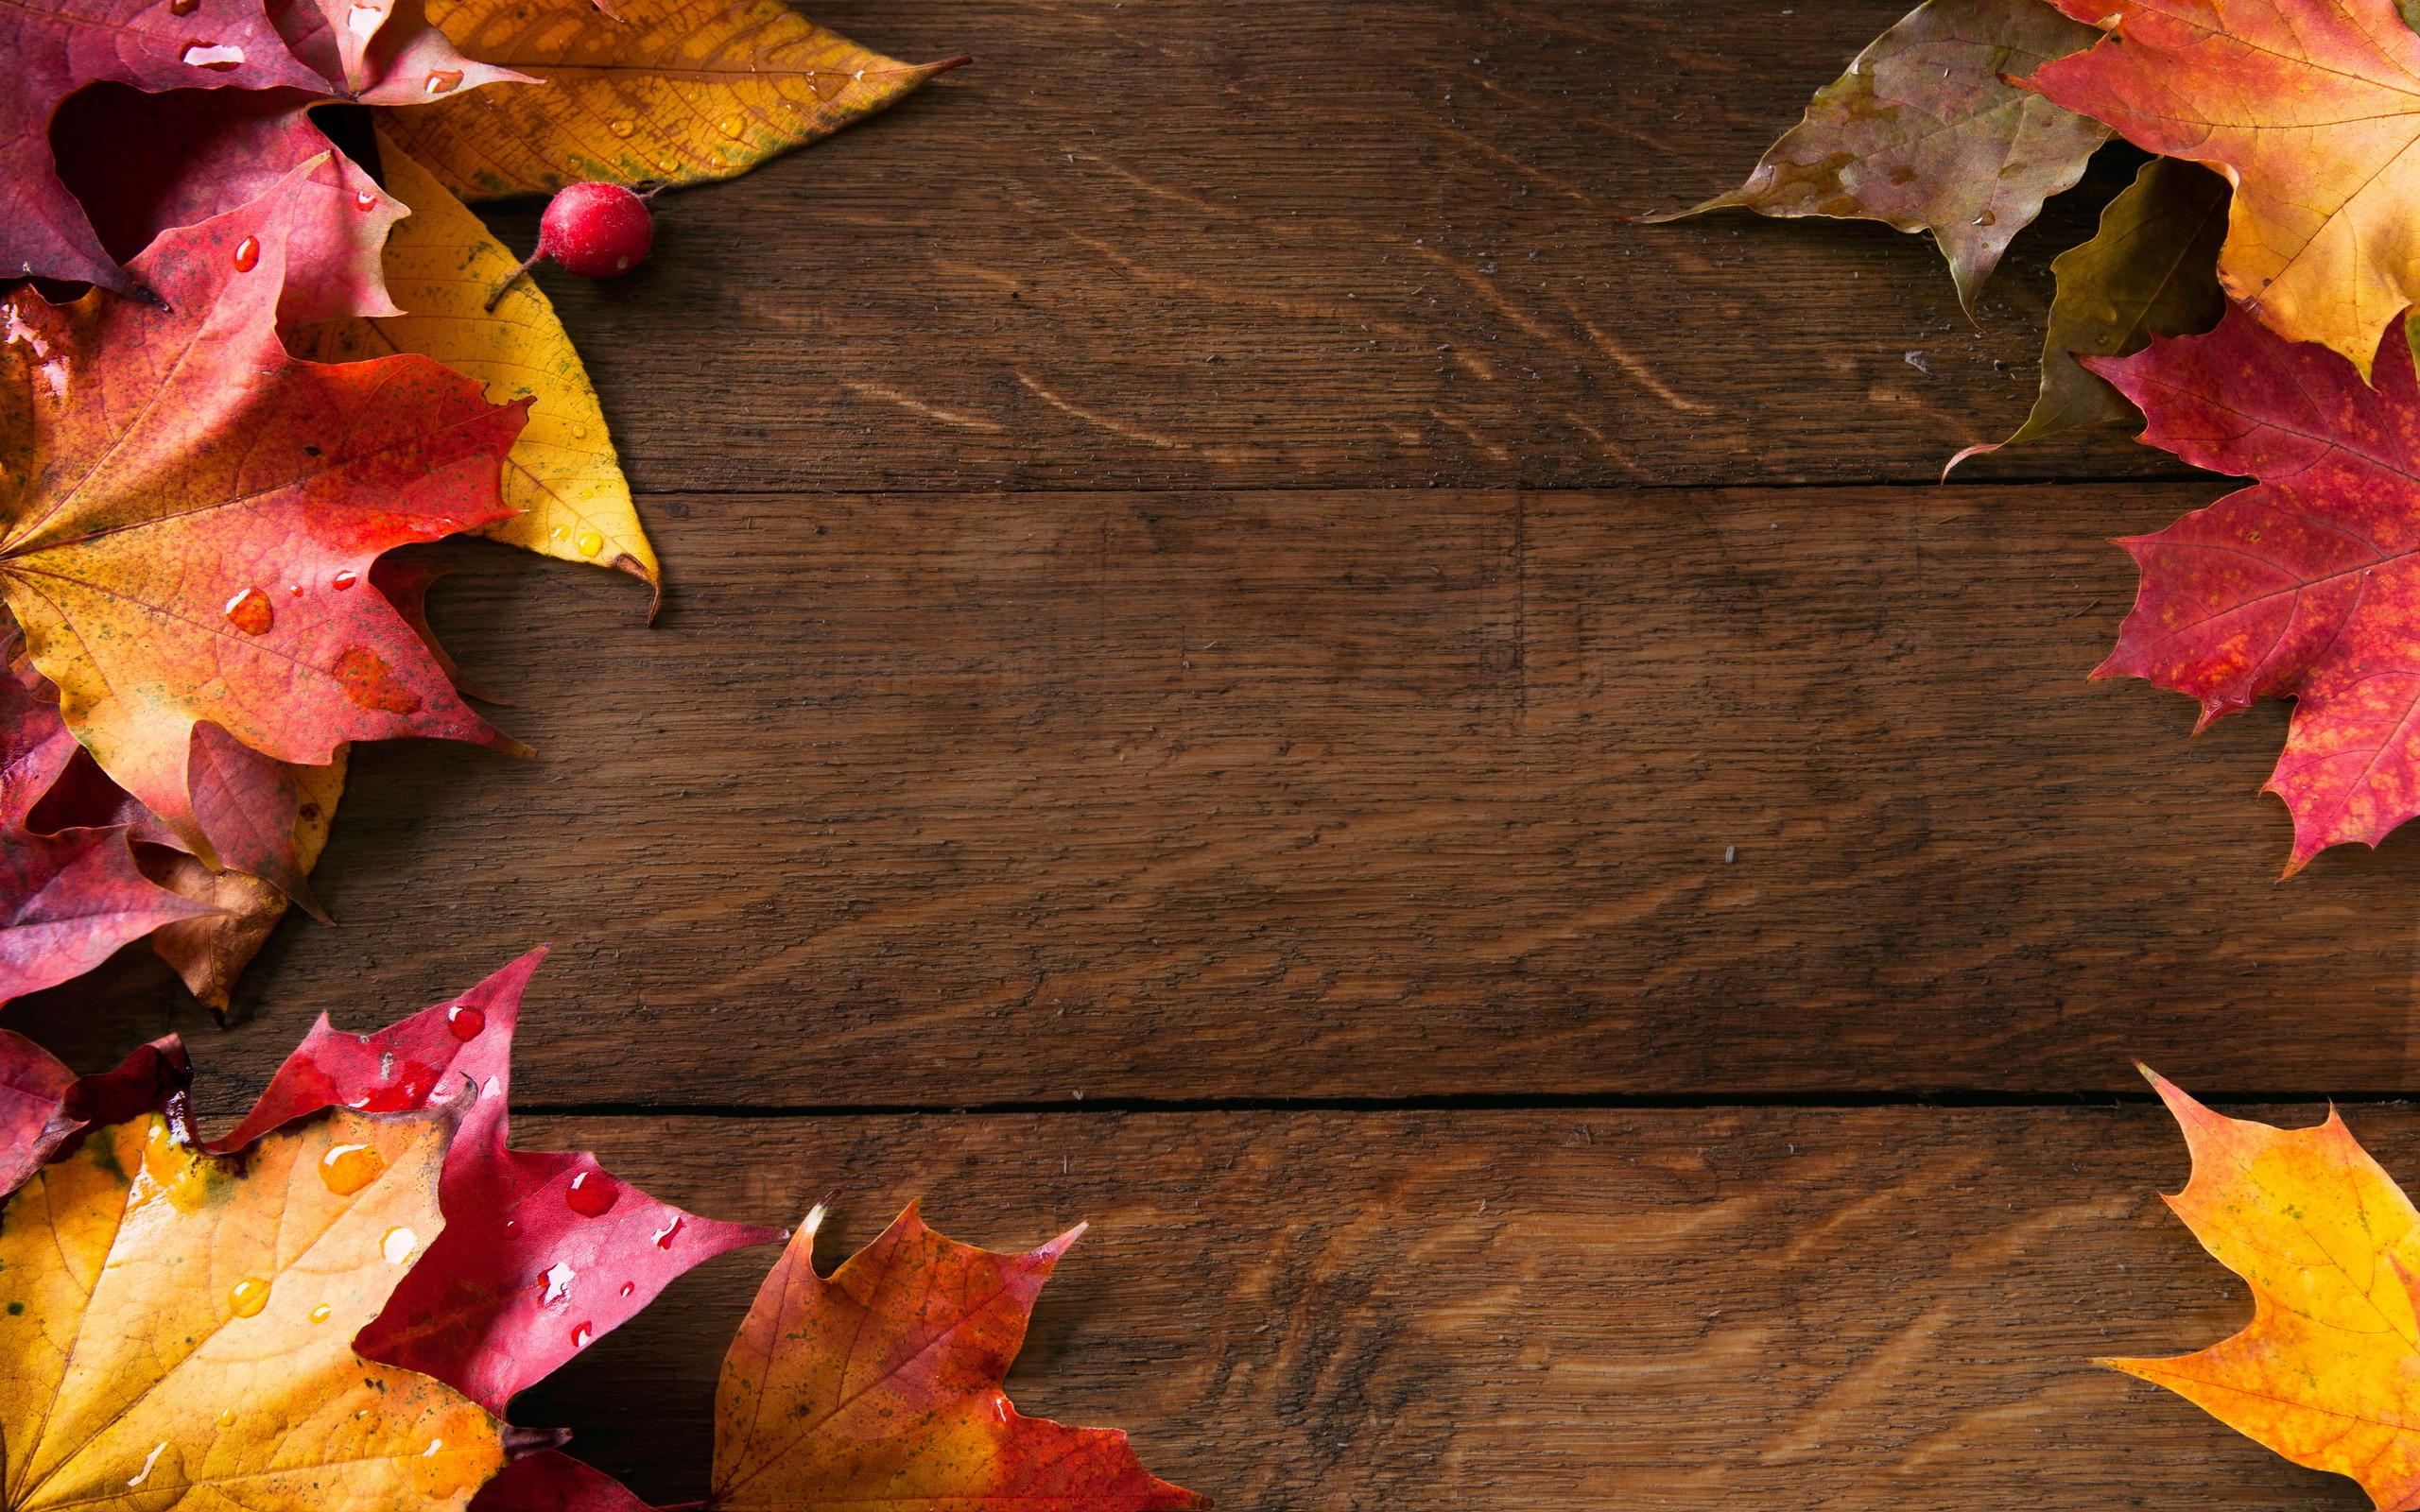 High Resolution Wallpaper Fall Leaves Fall Themed Wallpaper 183 ①